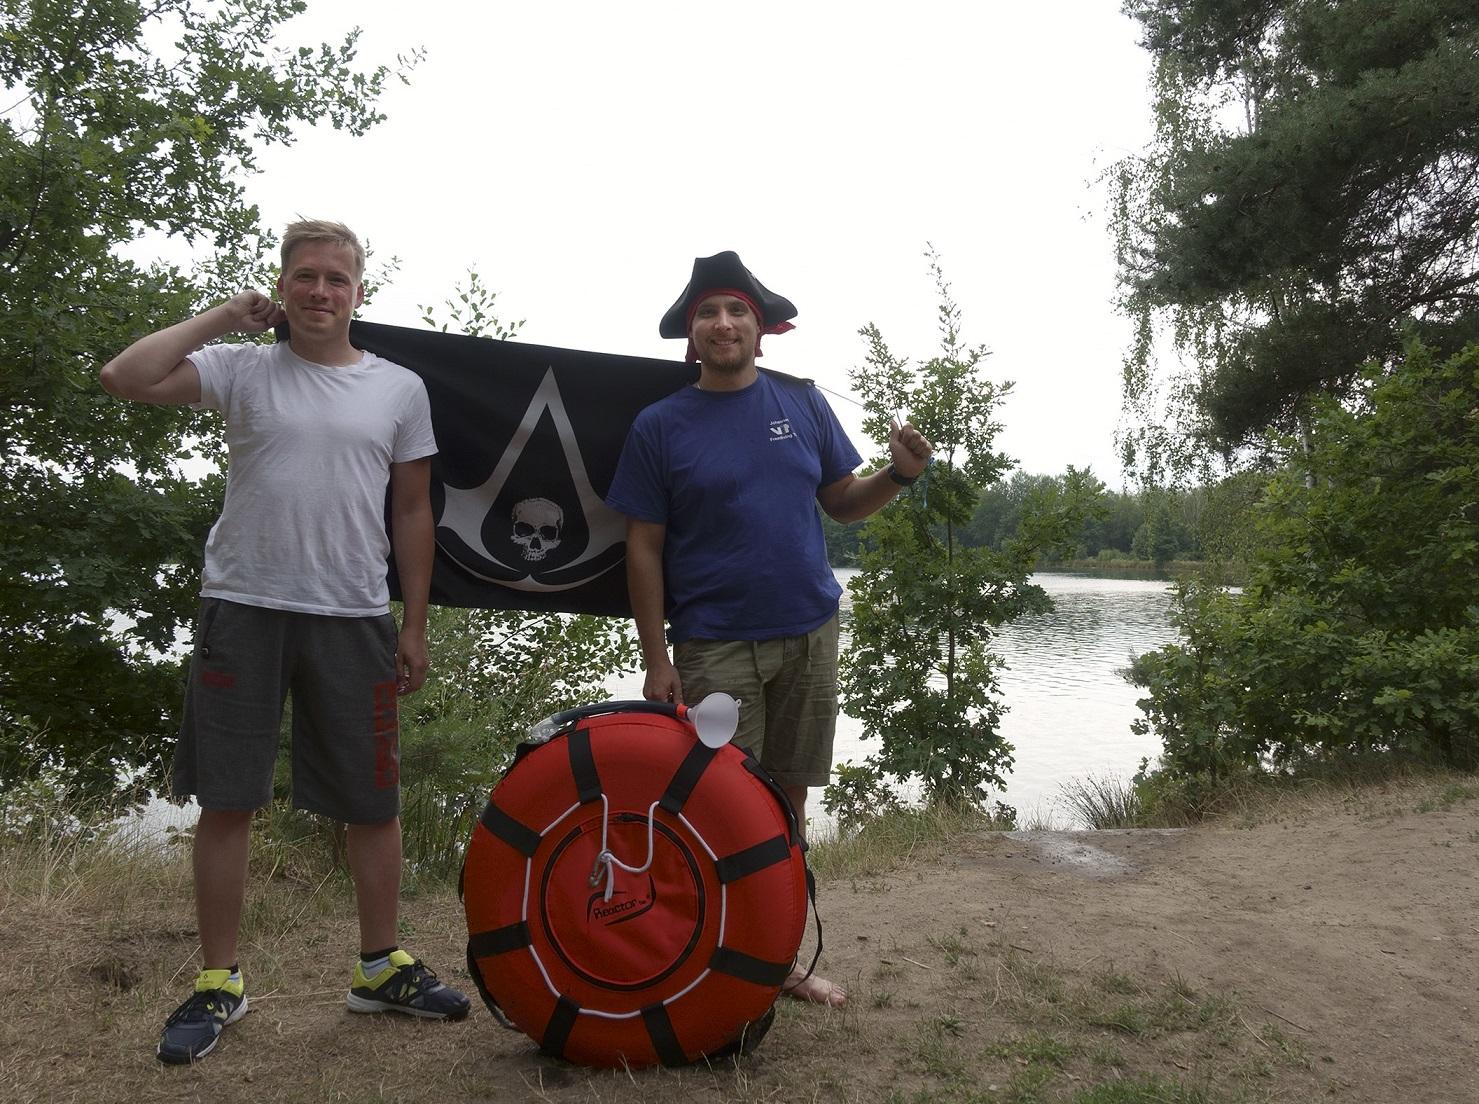 Apnoe-Tauchen am Murner See